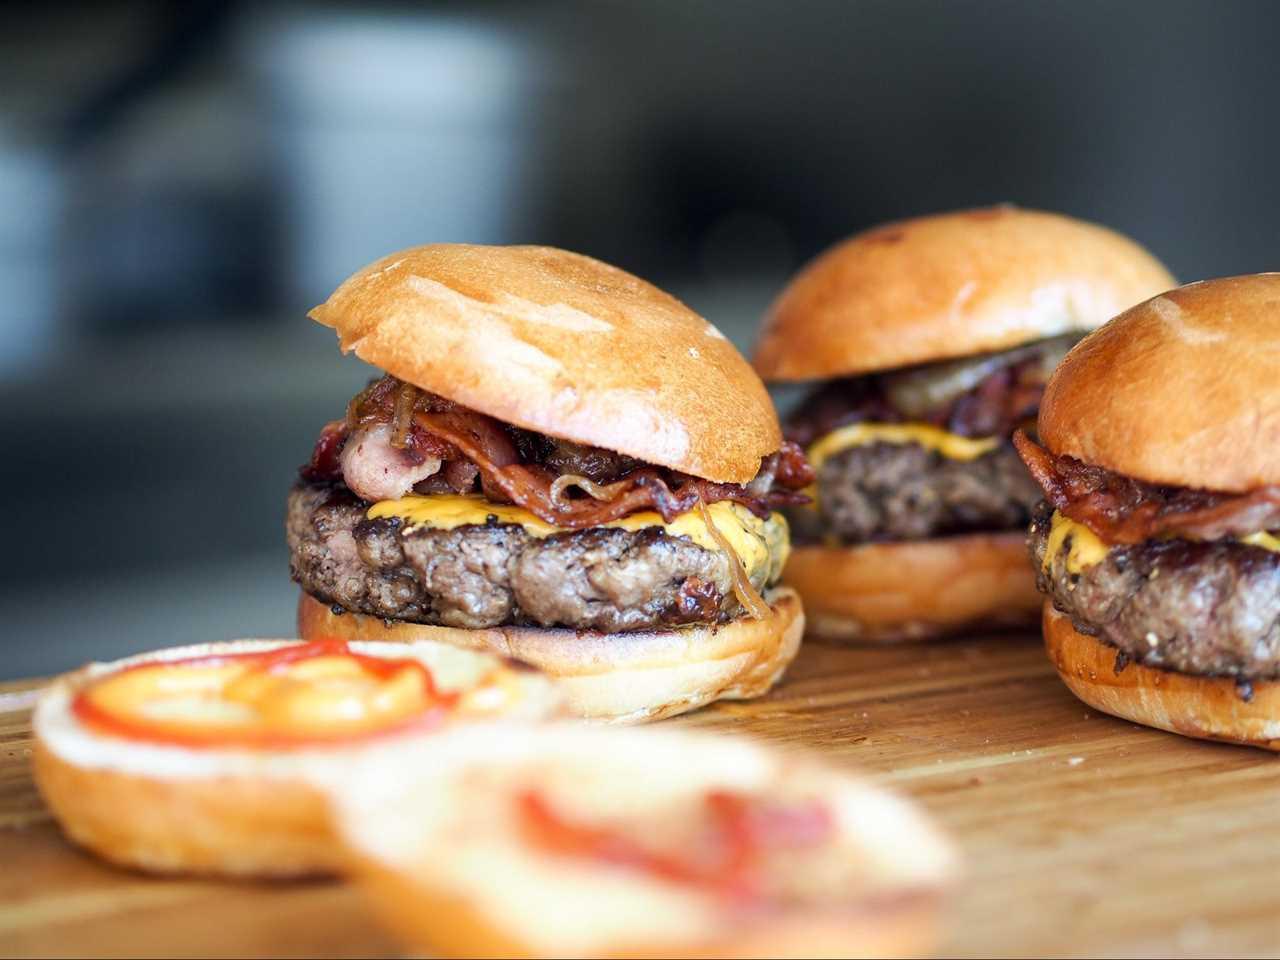 Restaurant marketing with food photos